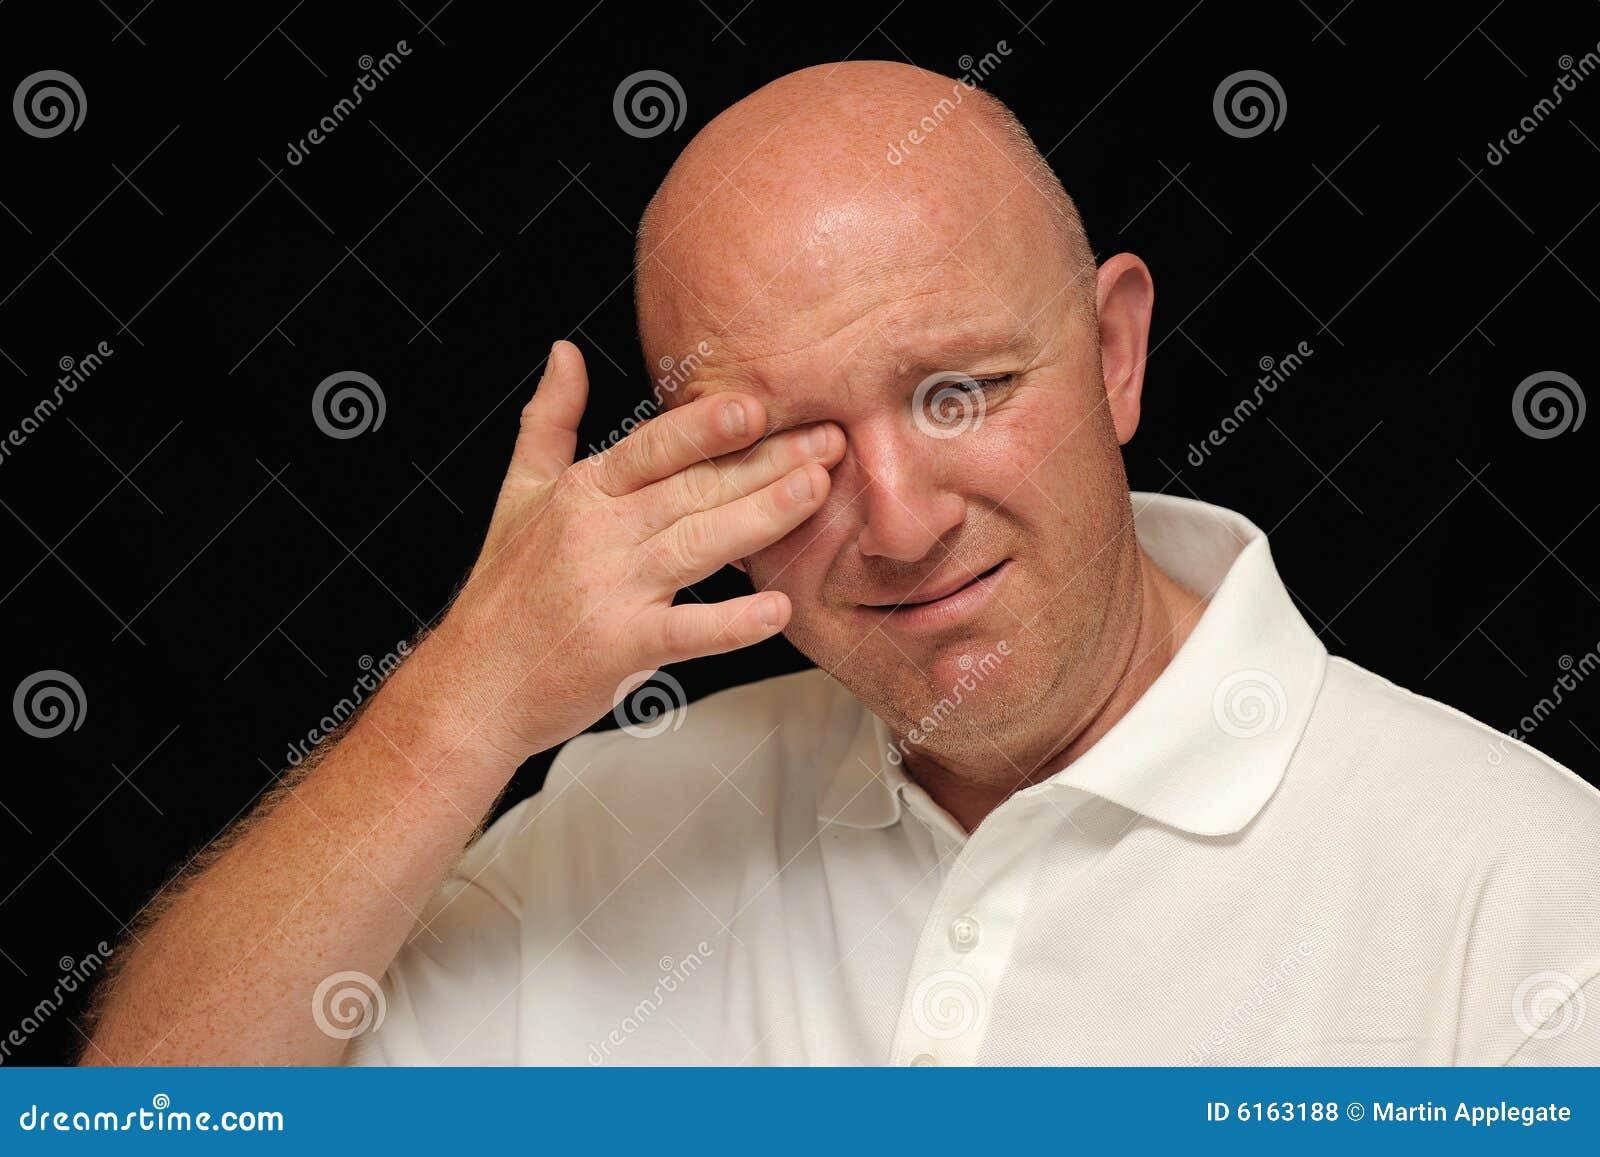 Bald man crying